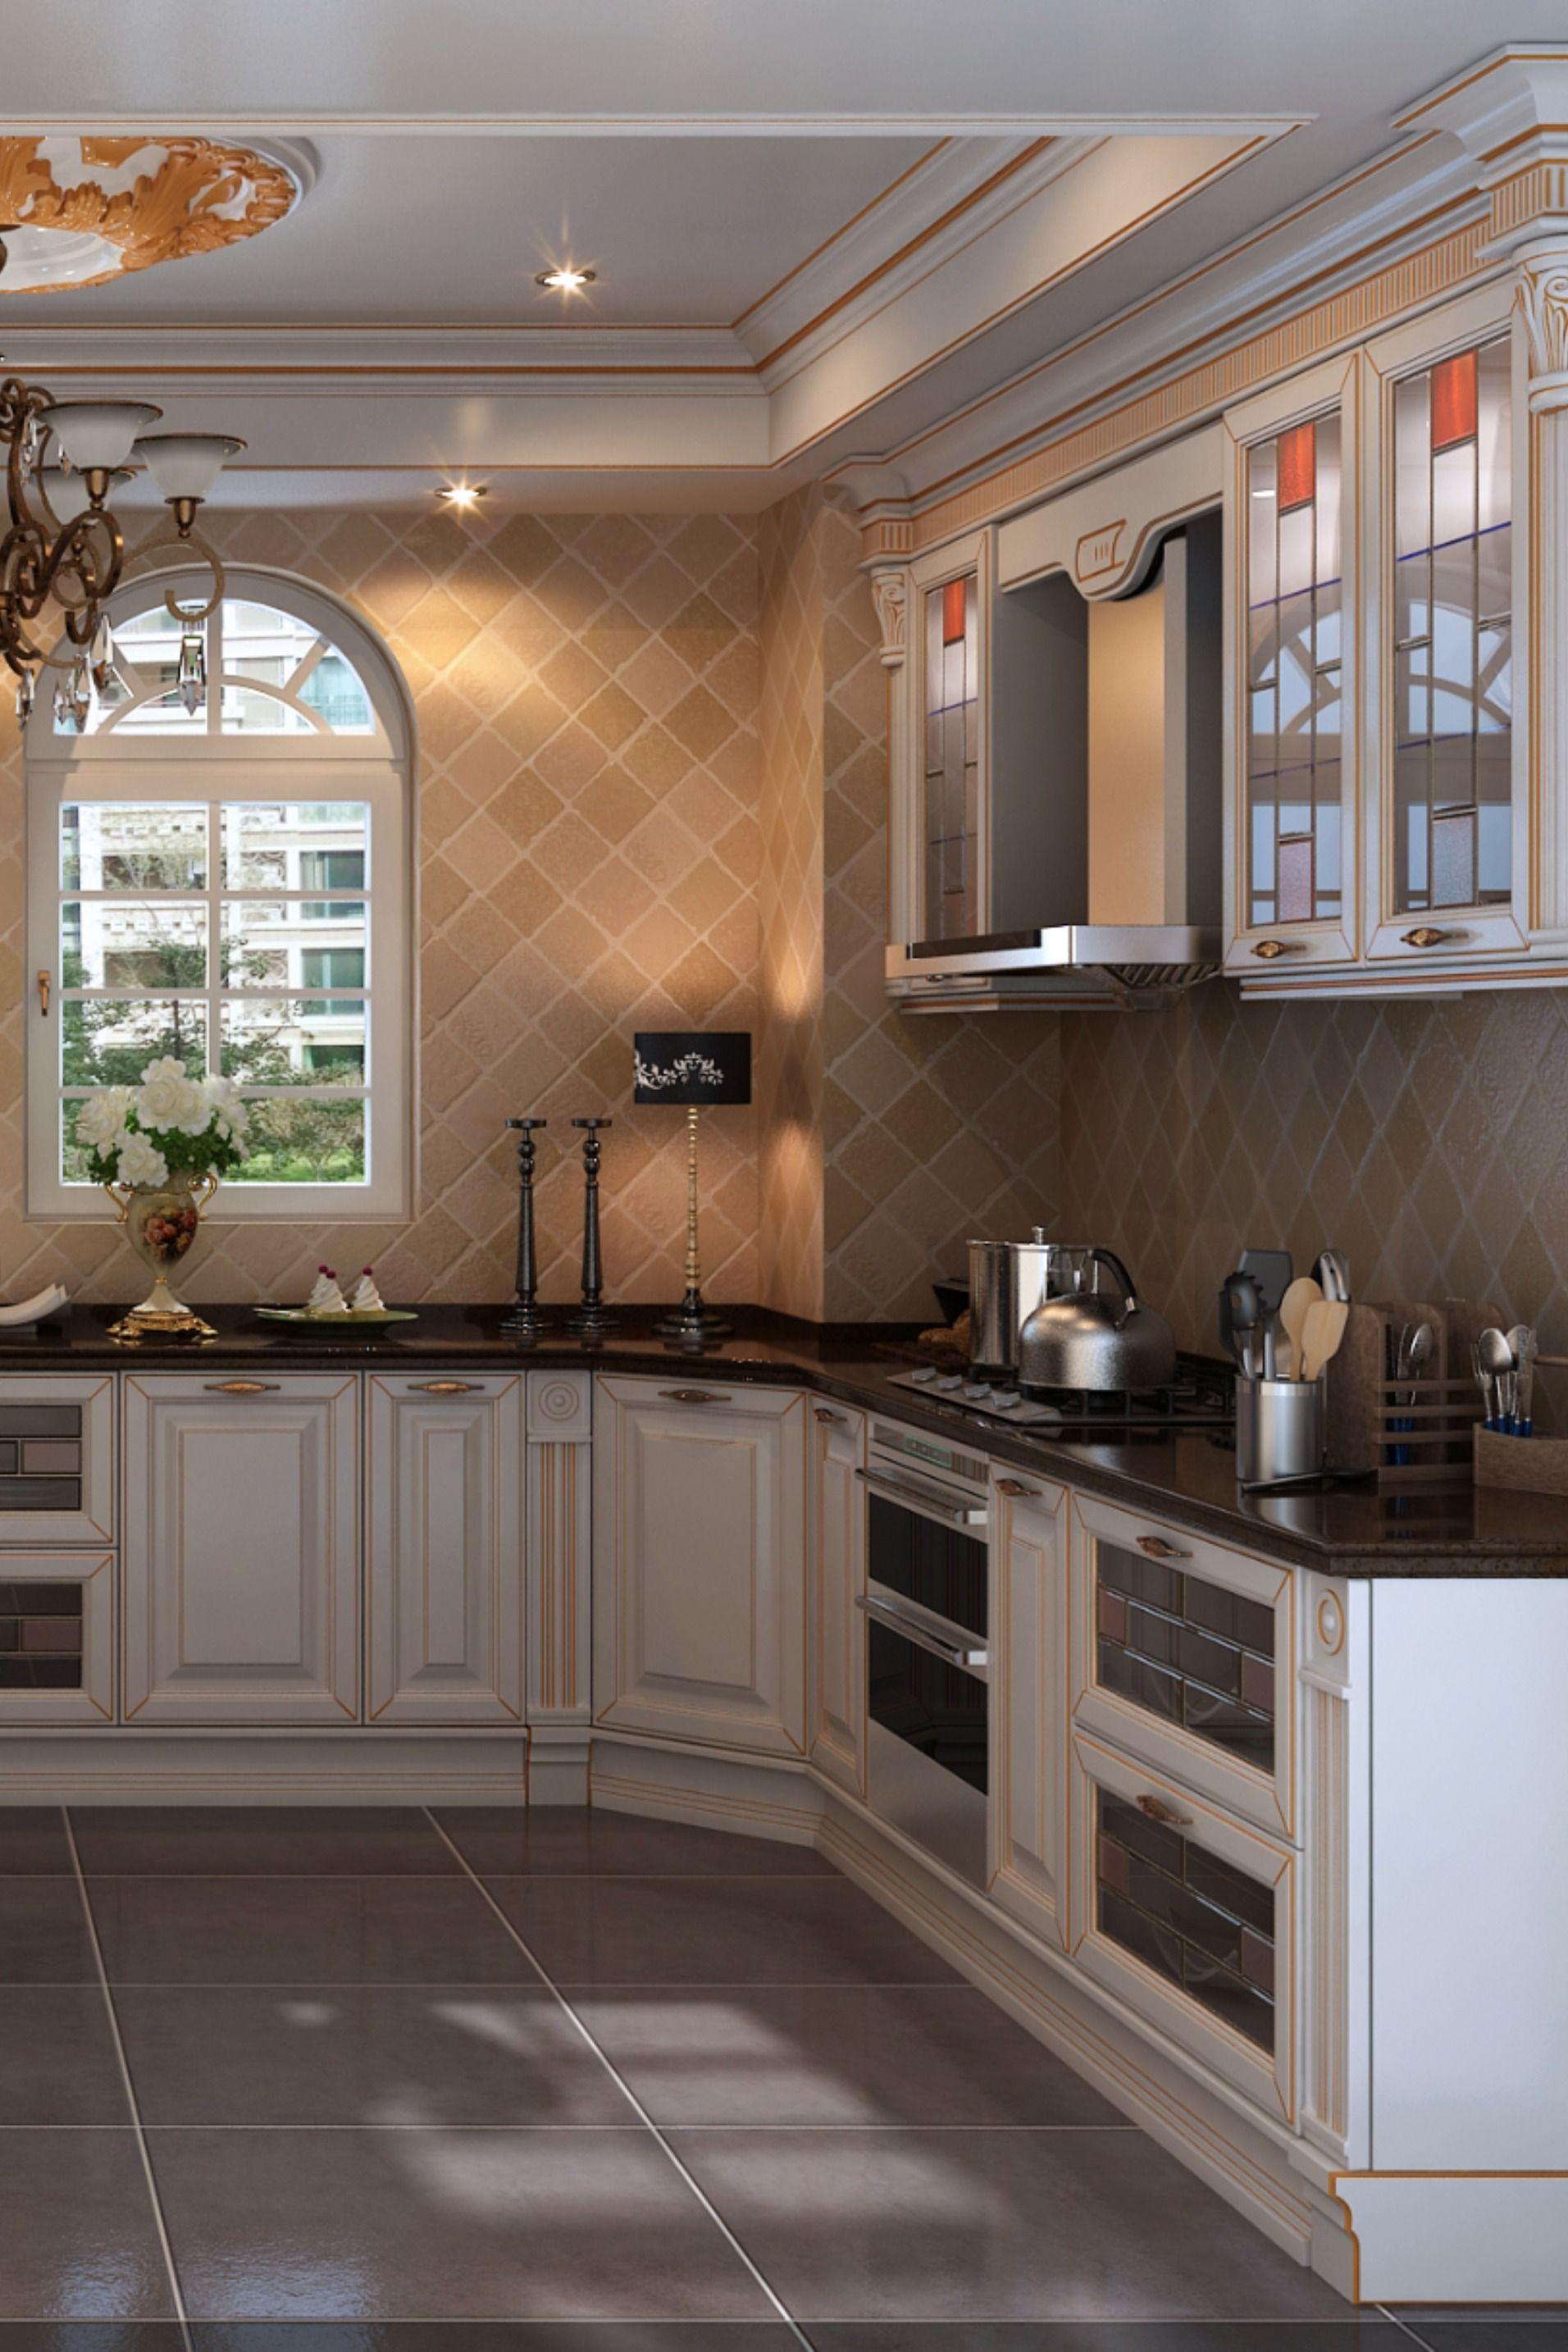 Pvc Blister Kitchen Cabinet Kitchen Cabinets European Kitchen Cabinets Kitchen Cabinet Styles